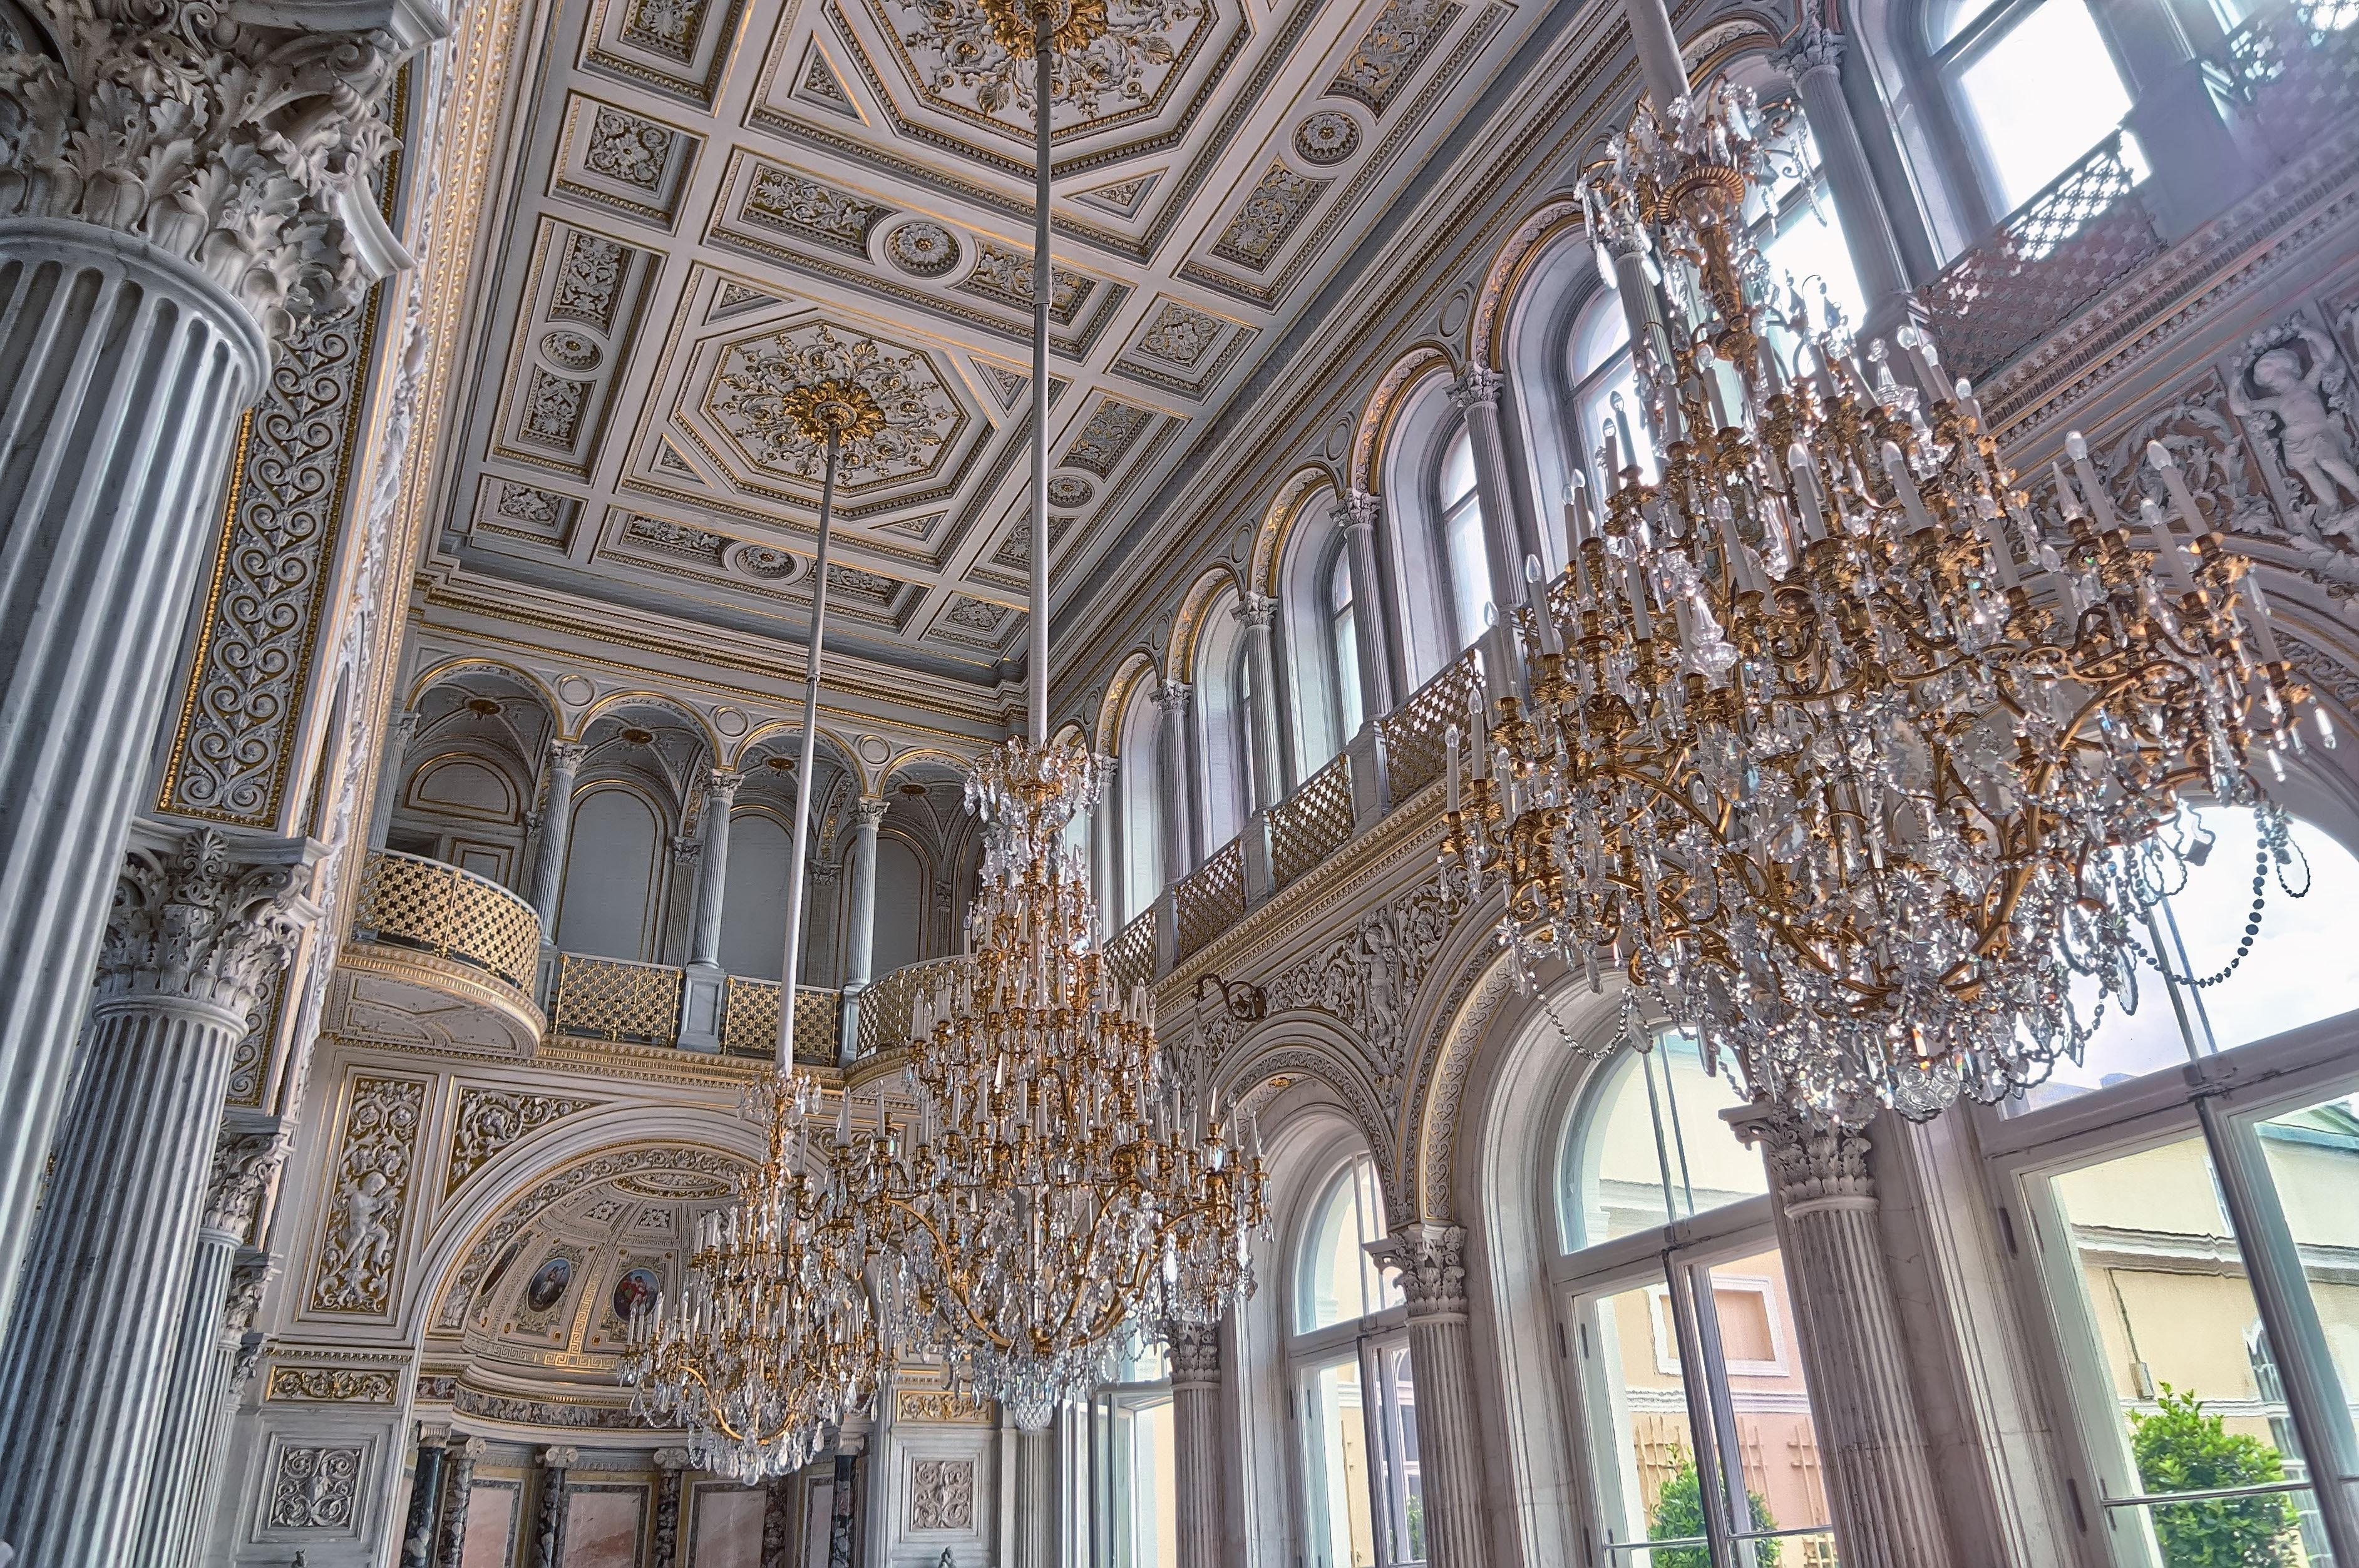 arches interior design trend